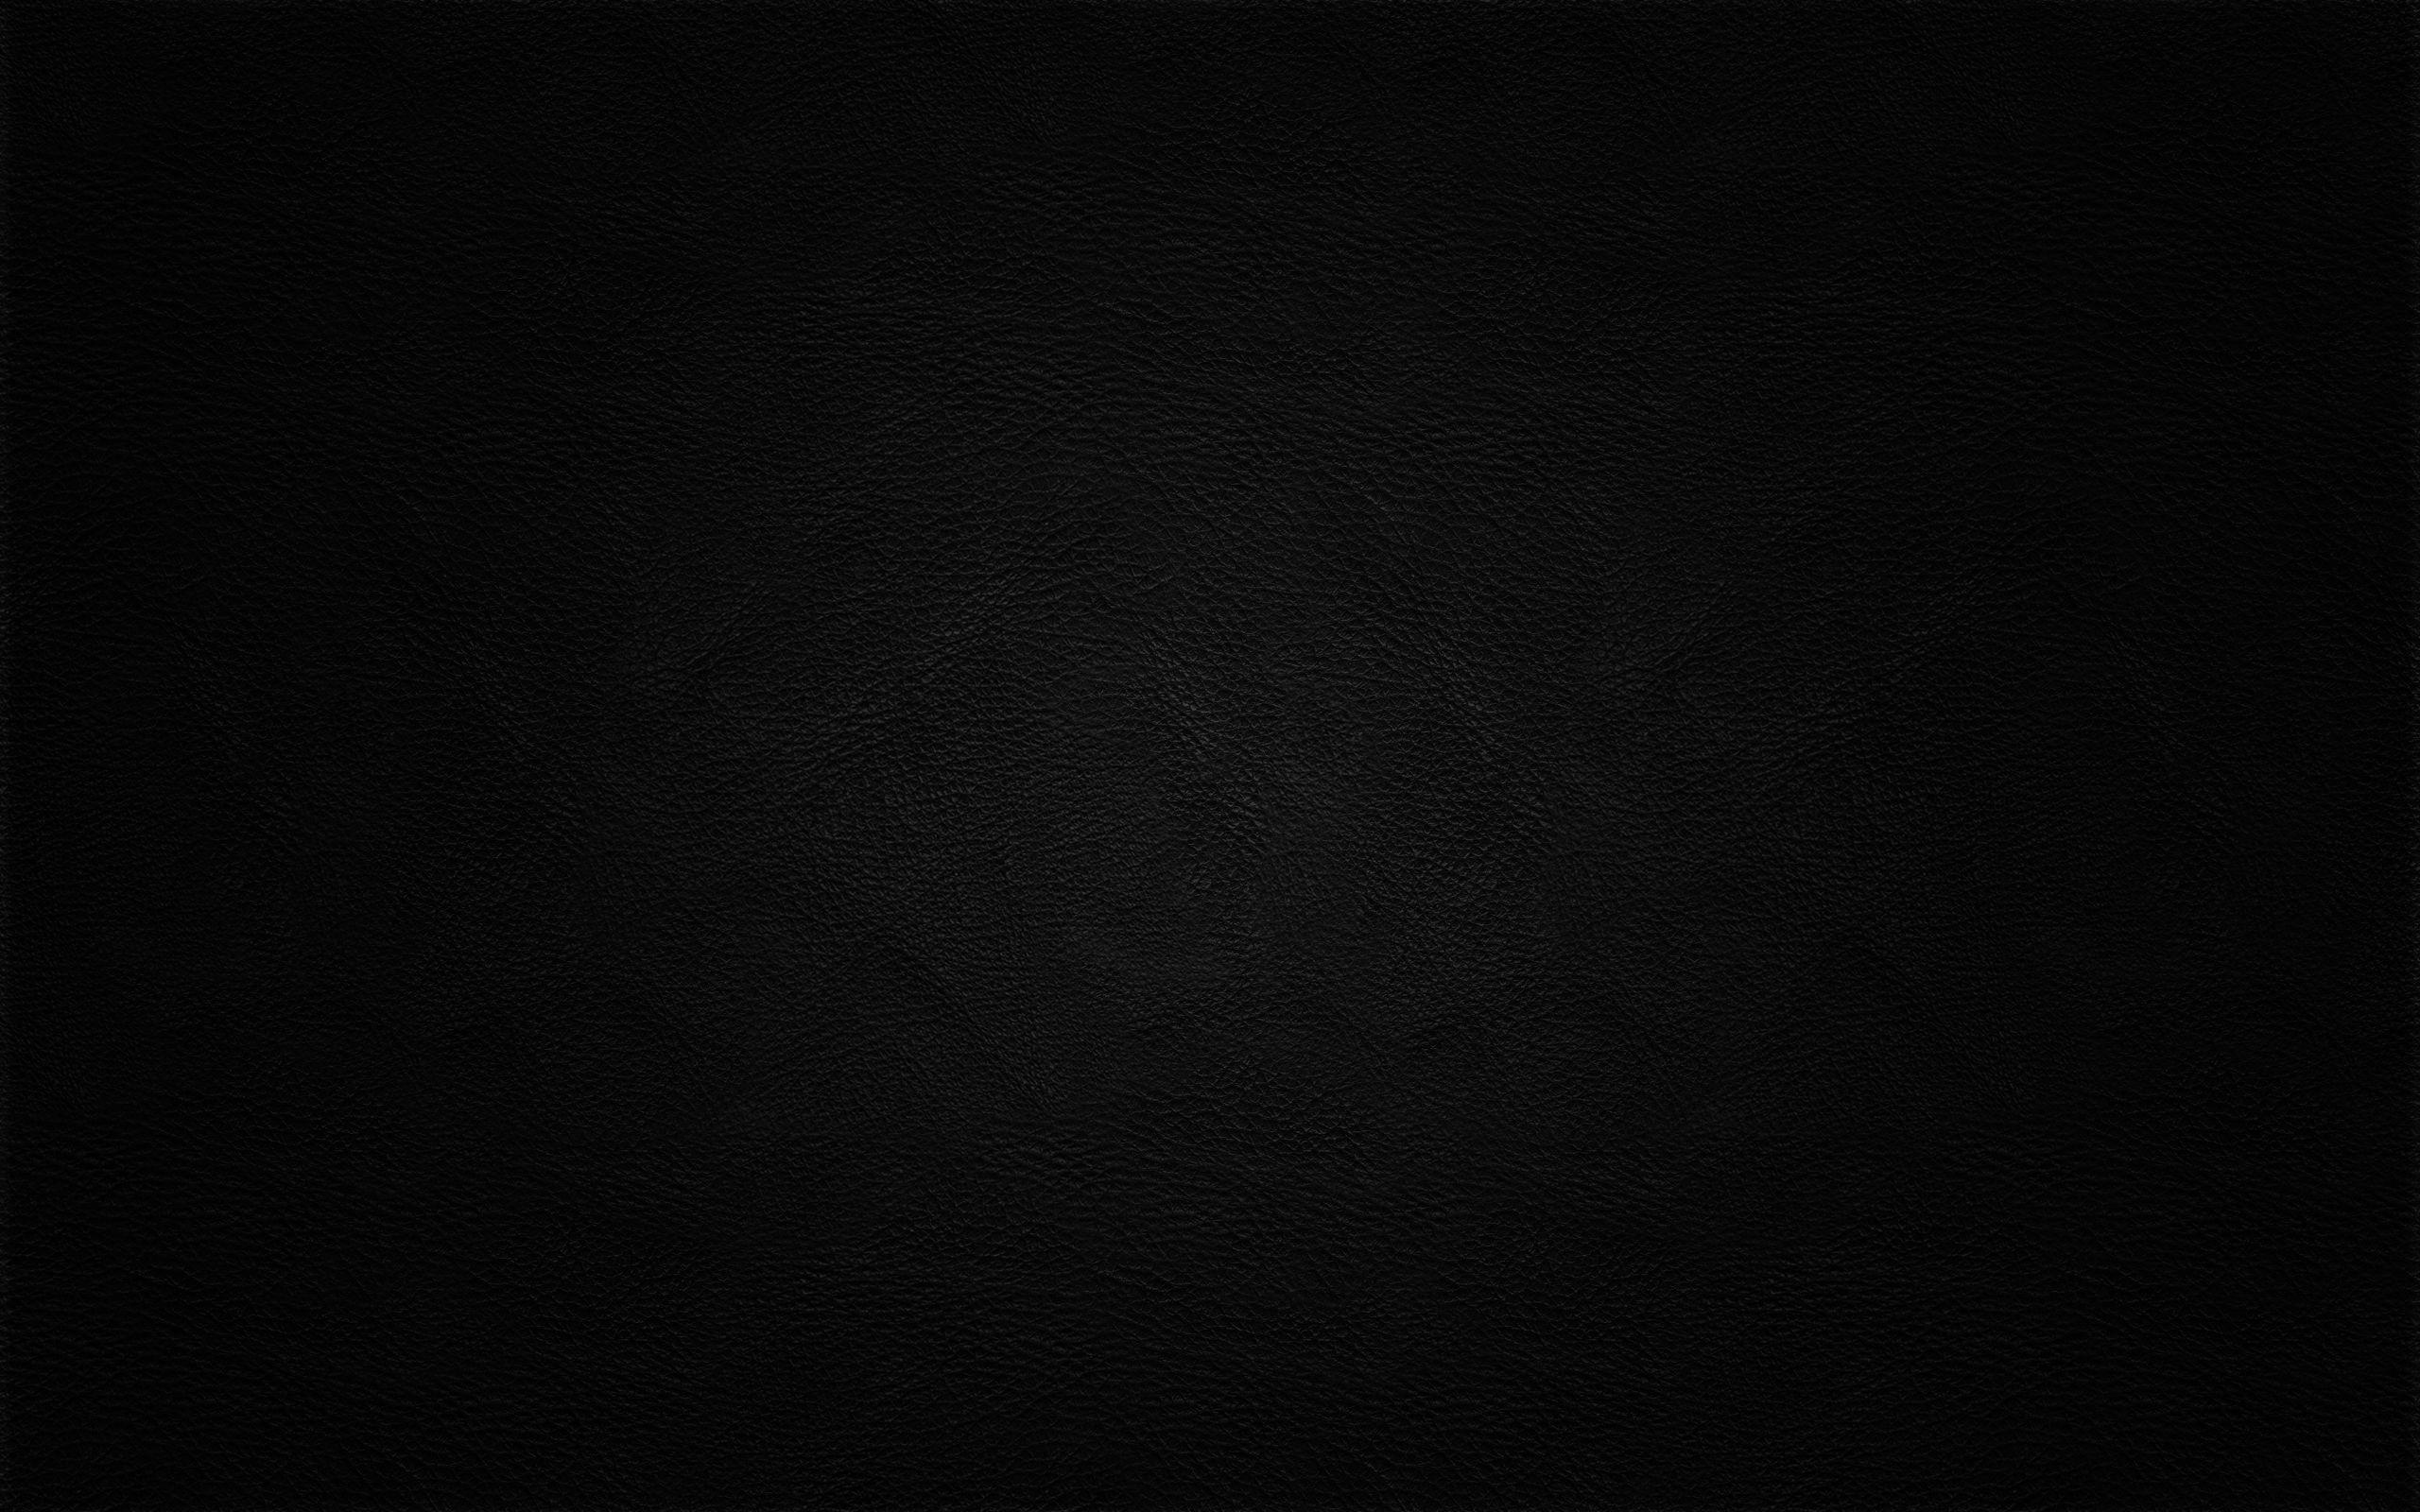 2560x1600 plain black wallpaper android